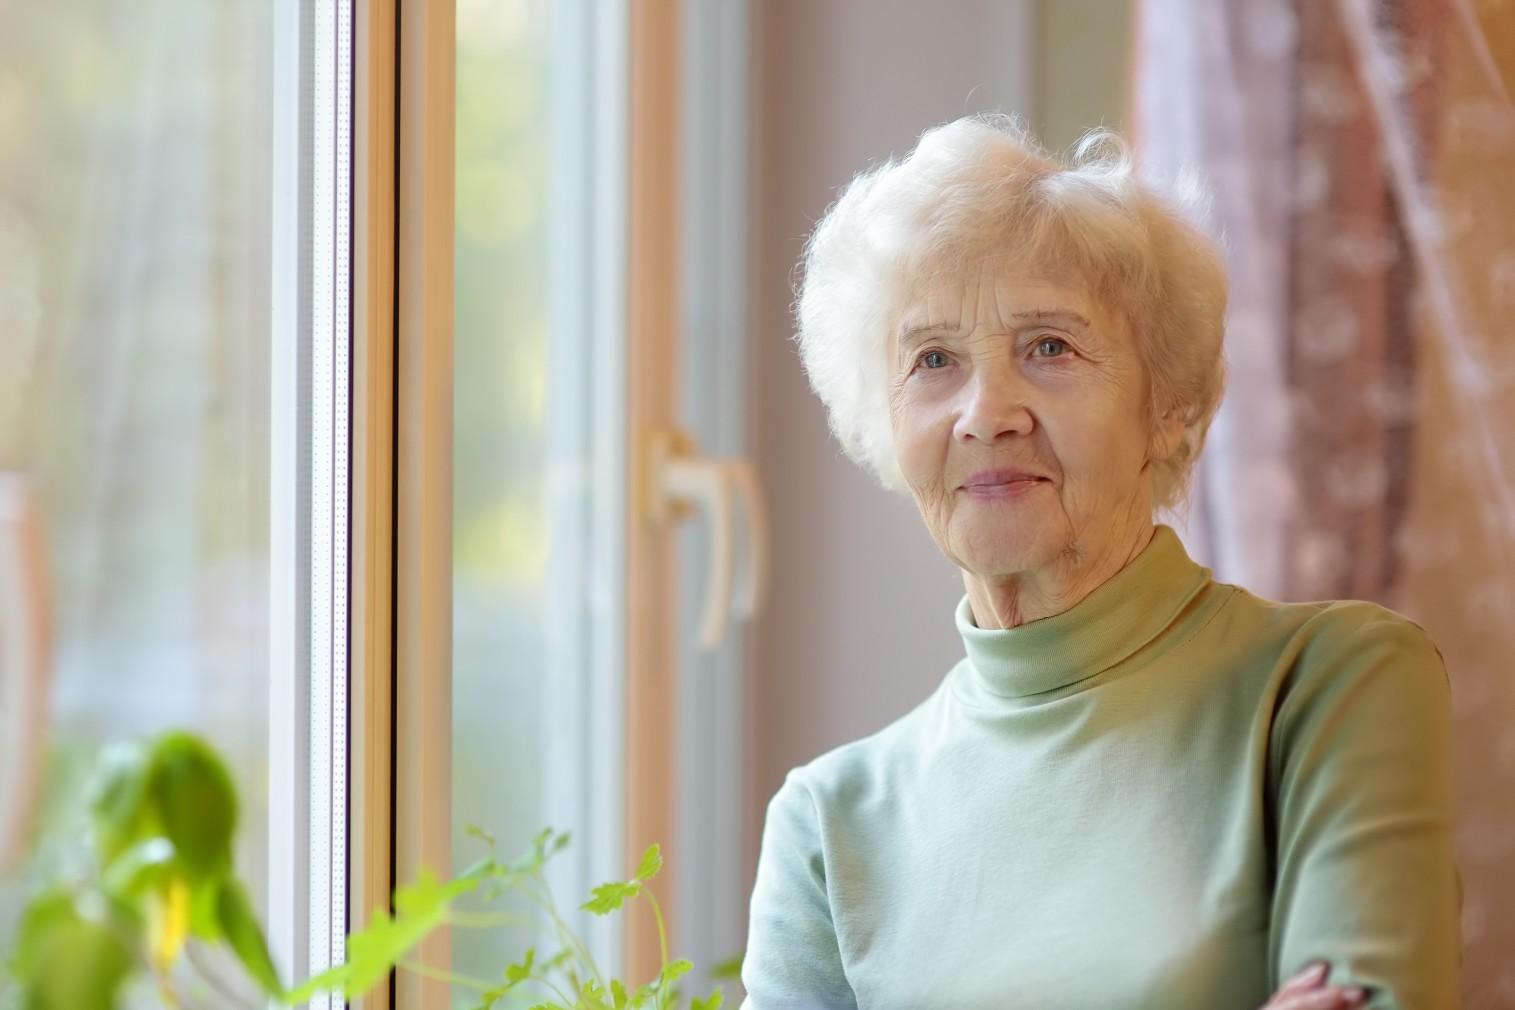 senior-woman-elderly-lady-70-75-75-80-longevity-retirement-retired-attractive-indoors-home-active-age_t20_AVBGmm